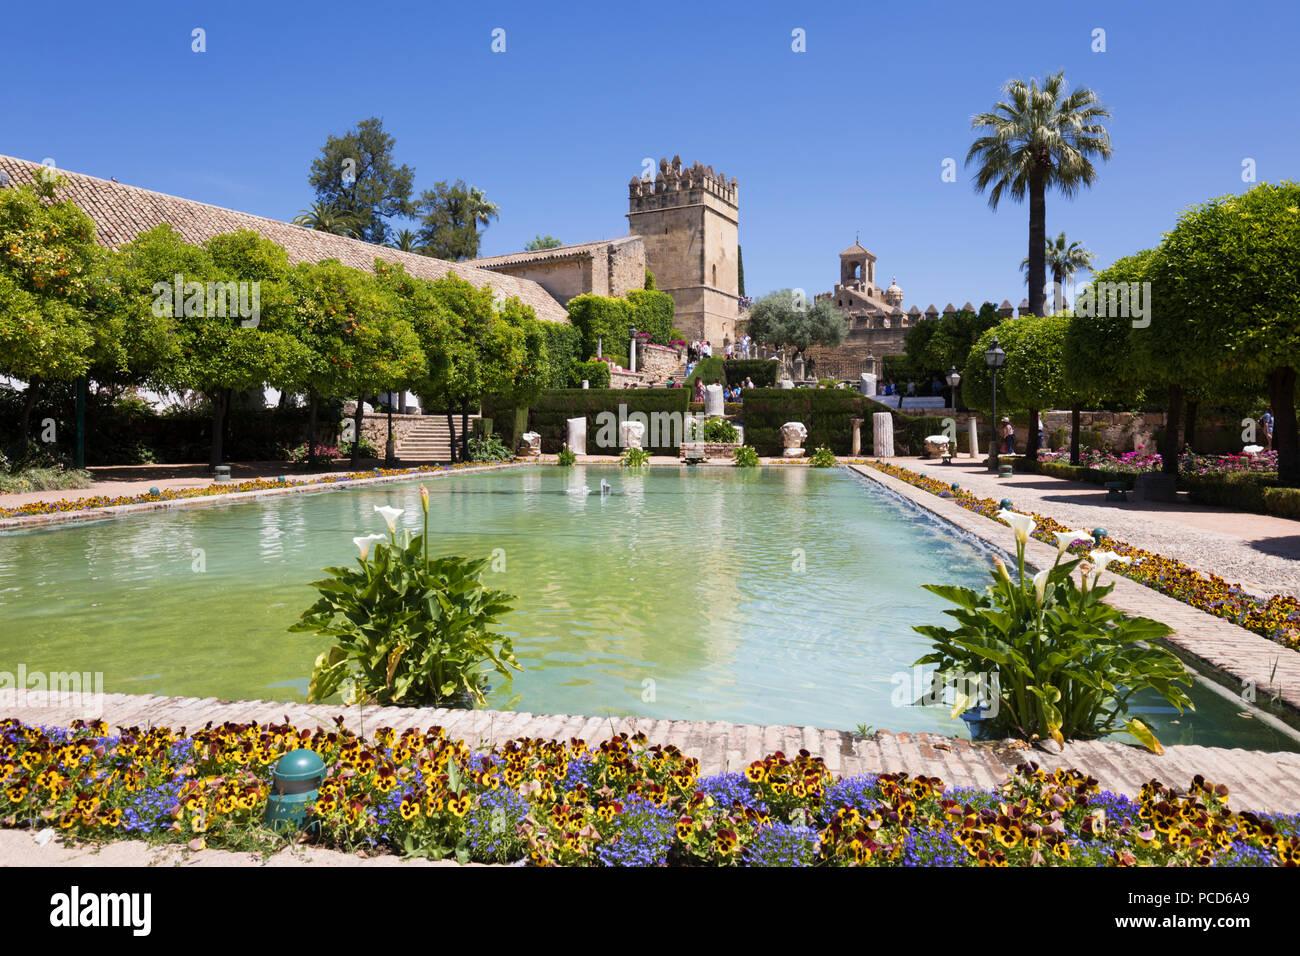 Die Gärten des Alcazar de los Reyes Cristianos, UNESCO-Weltkulturerbe, Cordoba, Andalusien, Spanien, Europa Stockbild